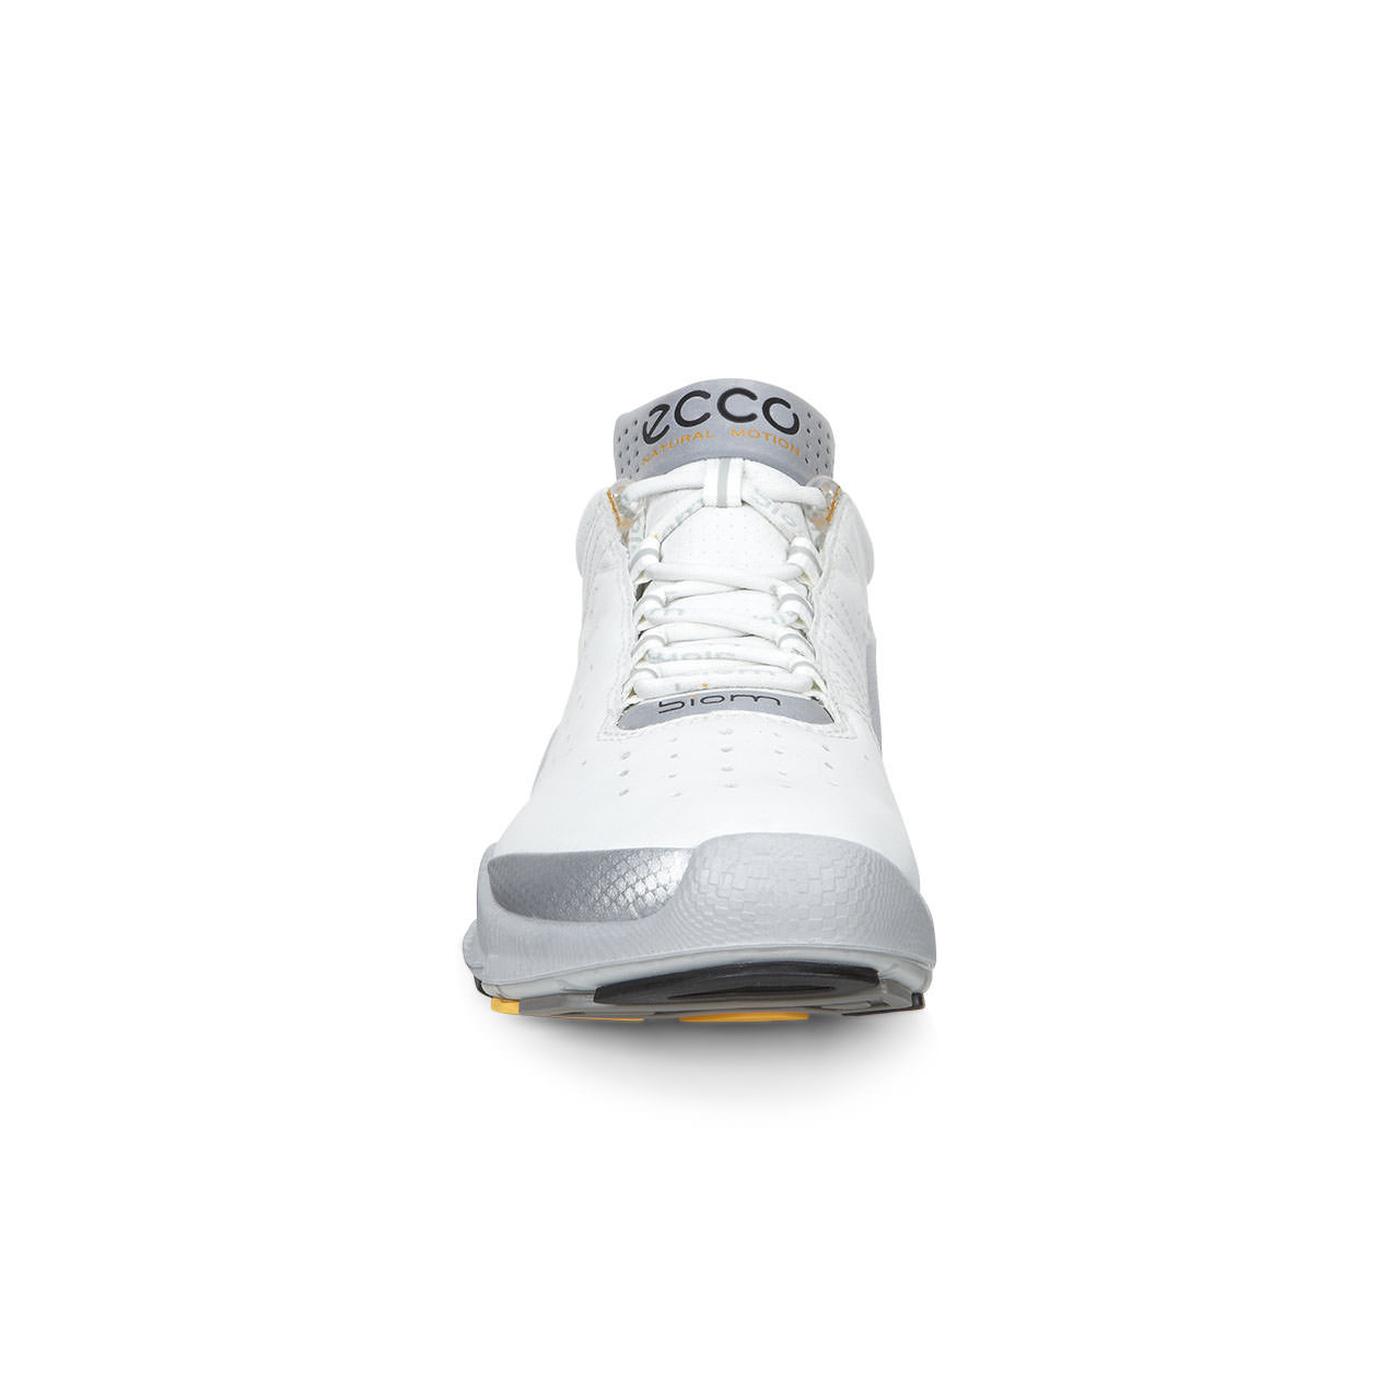 ECCO BIOM C 2.1 Womens Premium Sneaker